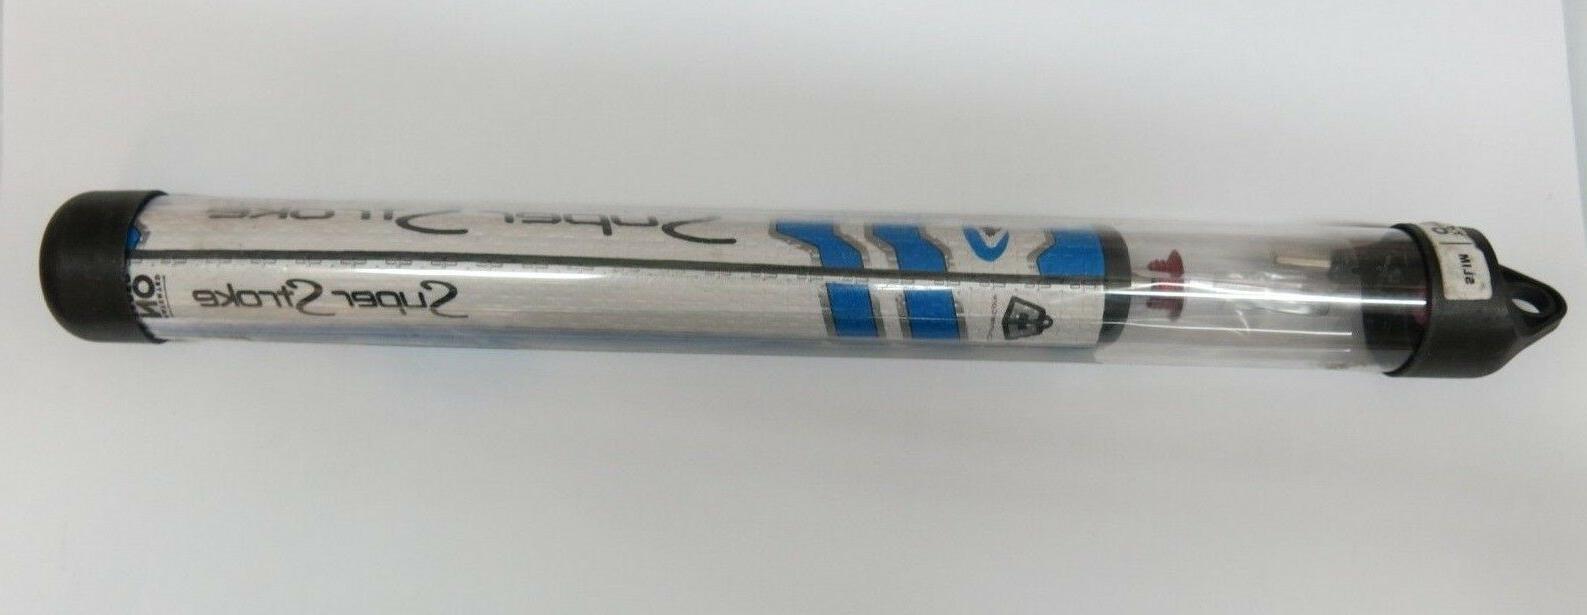 golf countercore slim 3 0 putter grip